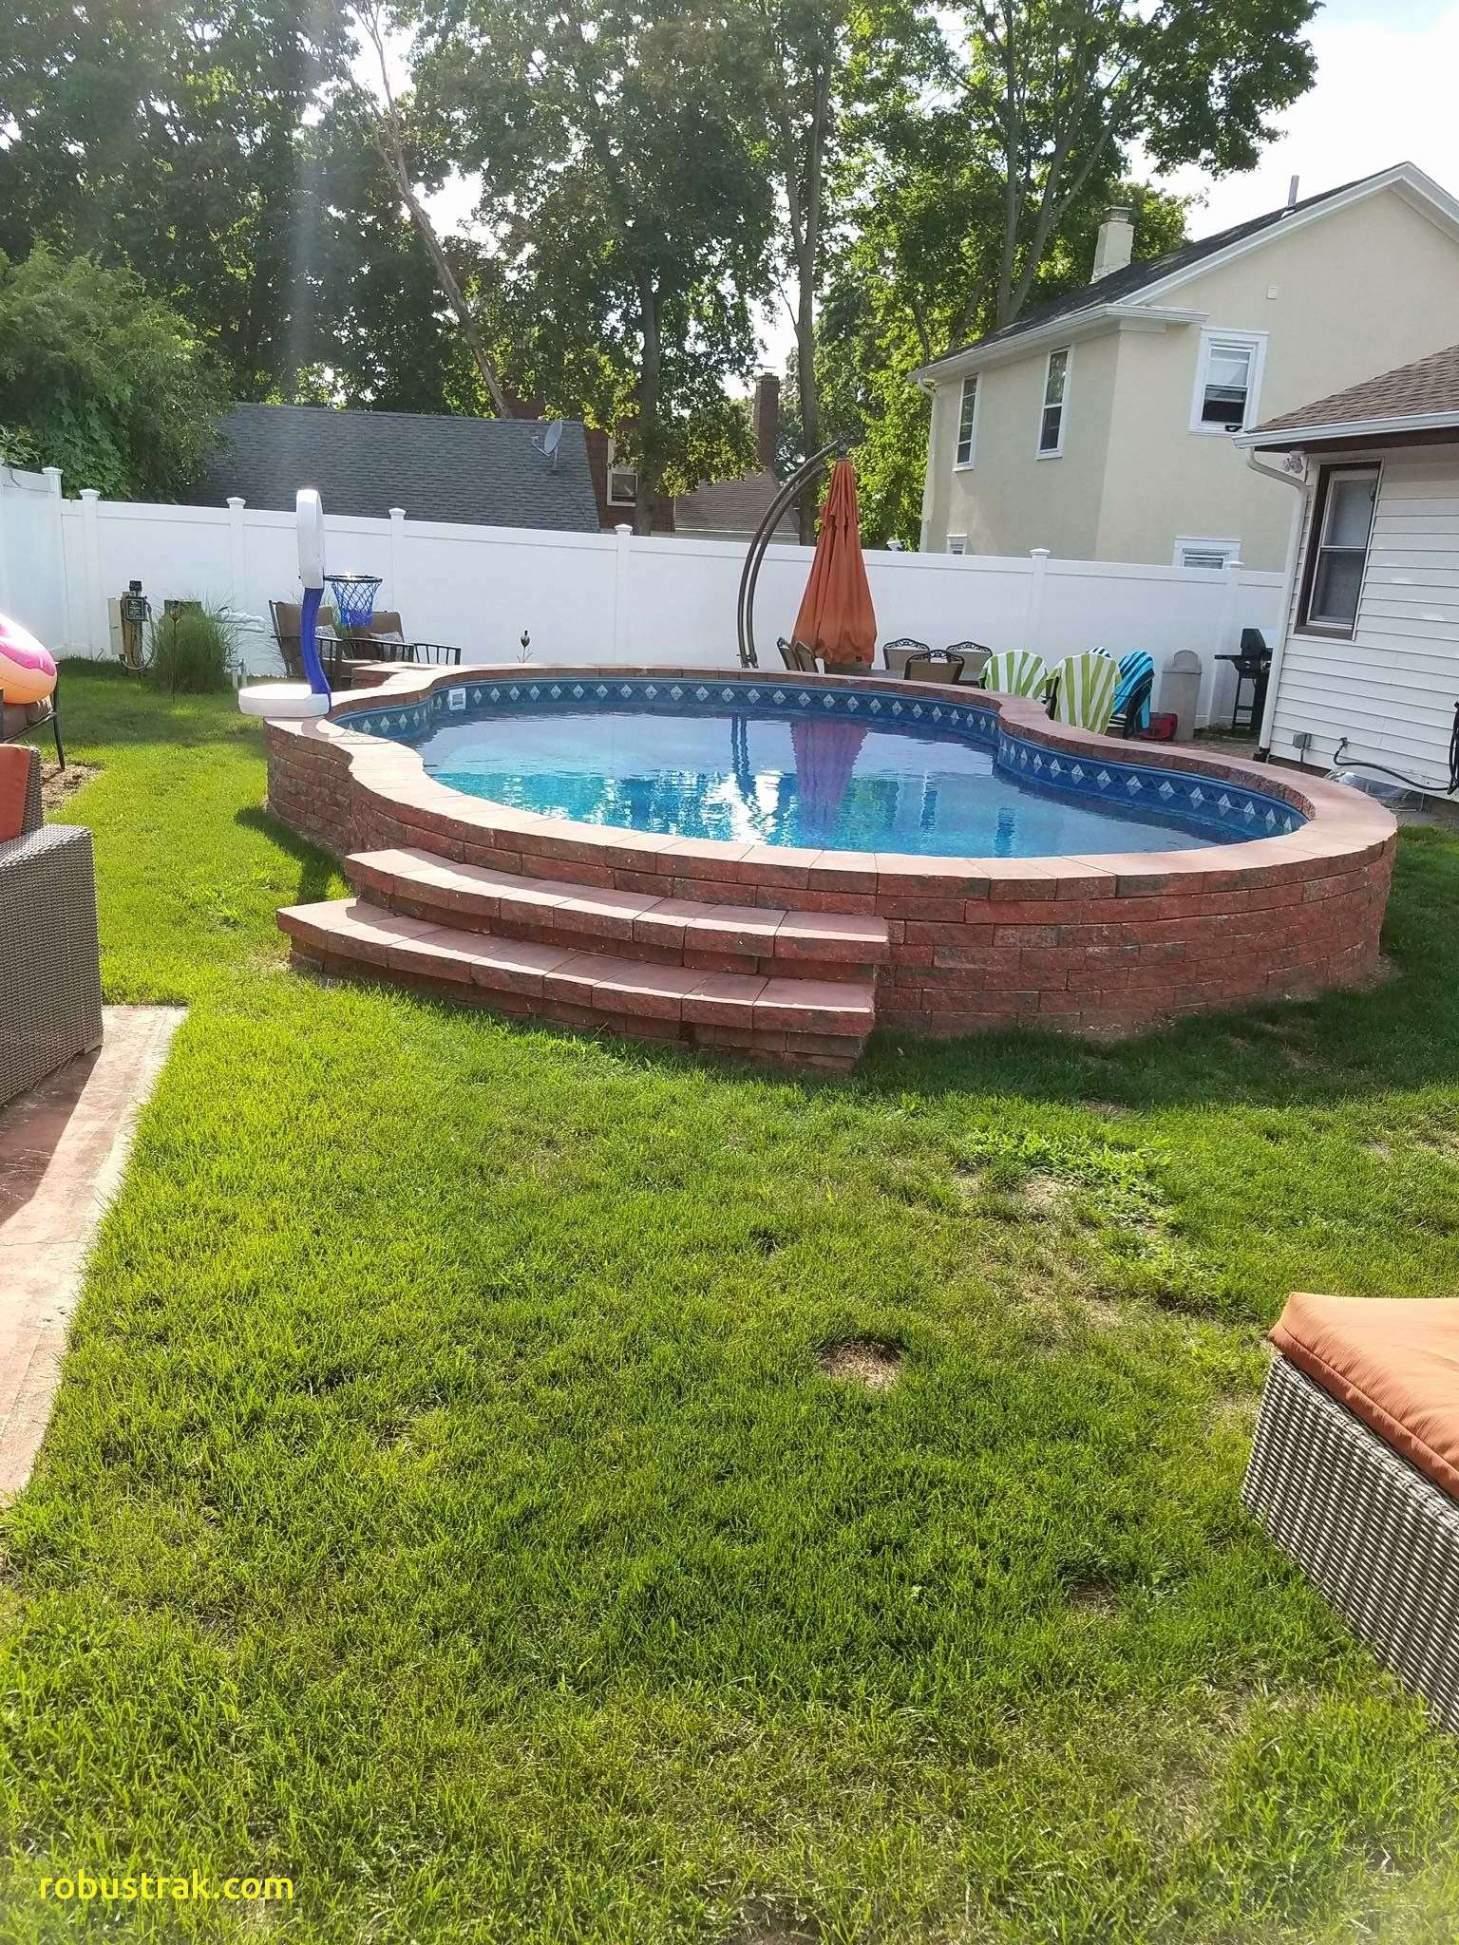 Garten Swimmingpool Schön Pool Kleiner Garten — Temobardz Home Blog